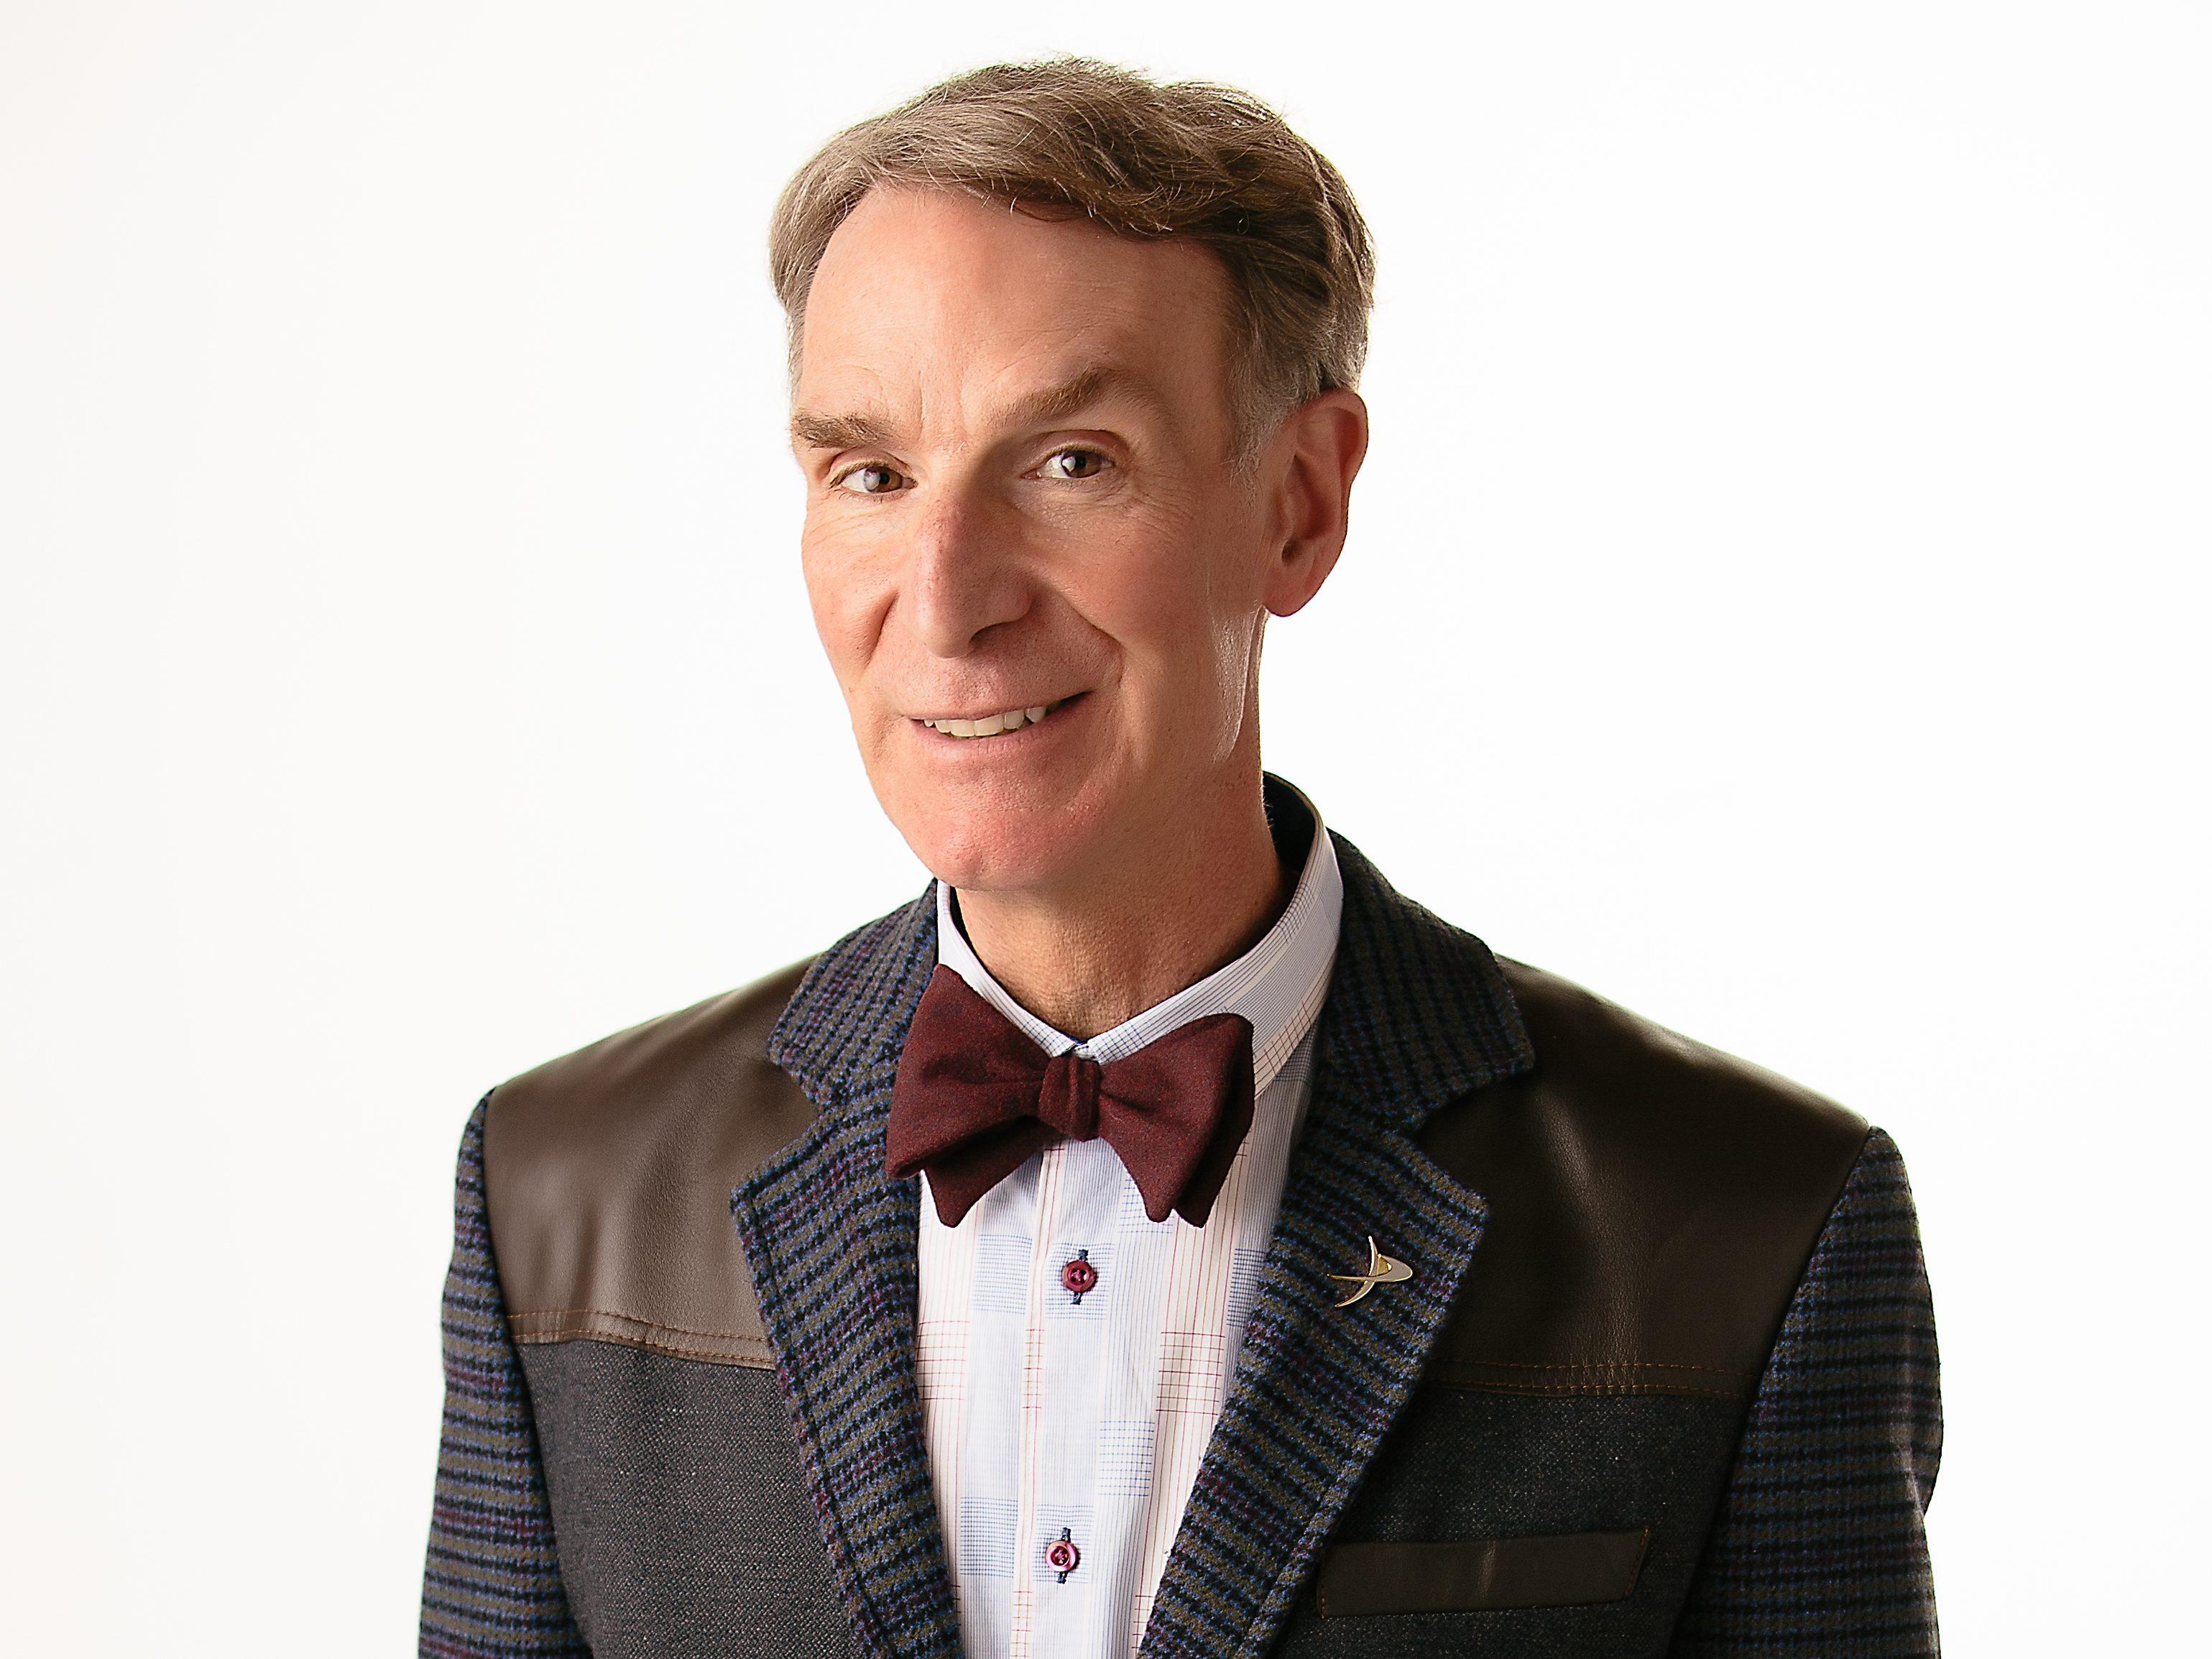 Bill Nye bringing his scientific savvy to new Netflix series